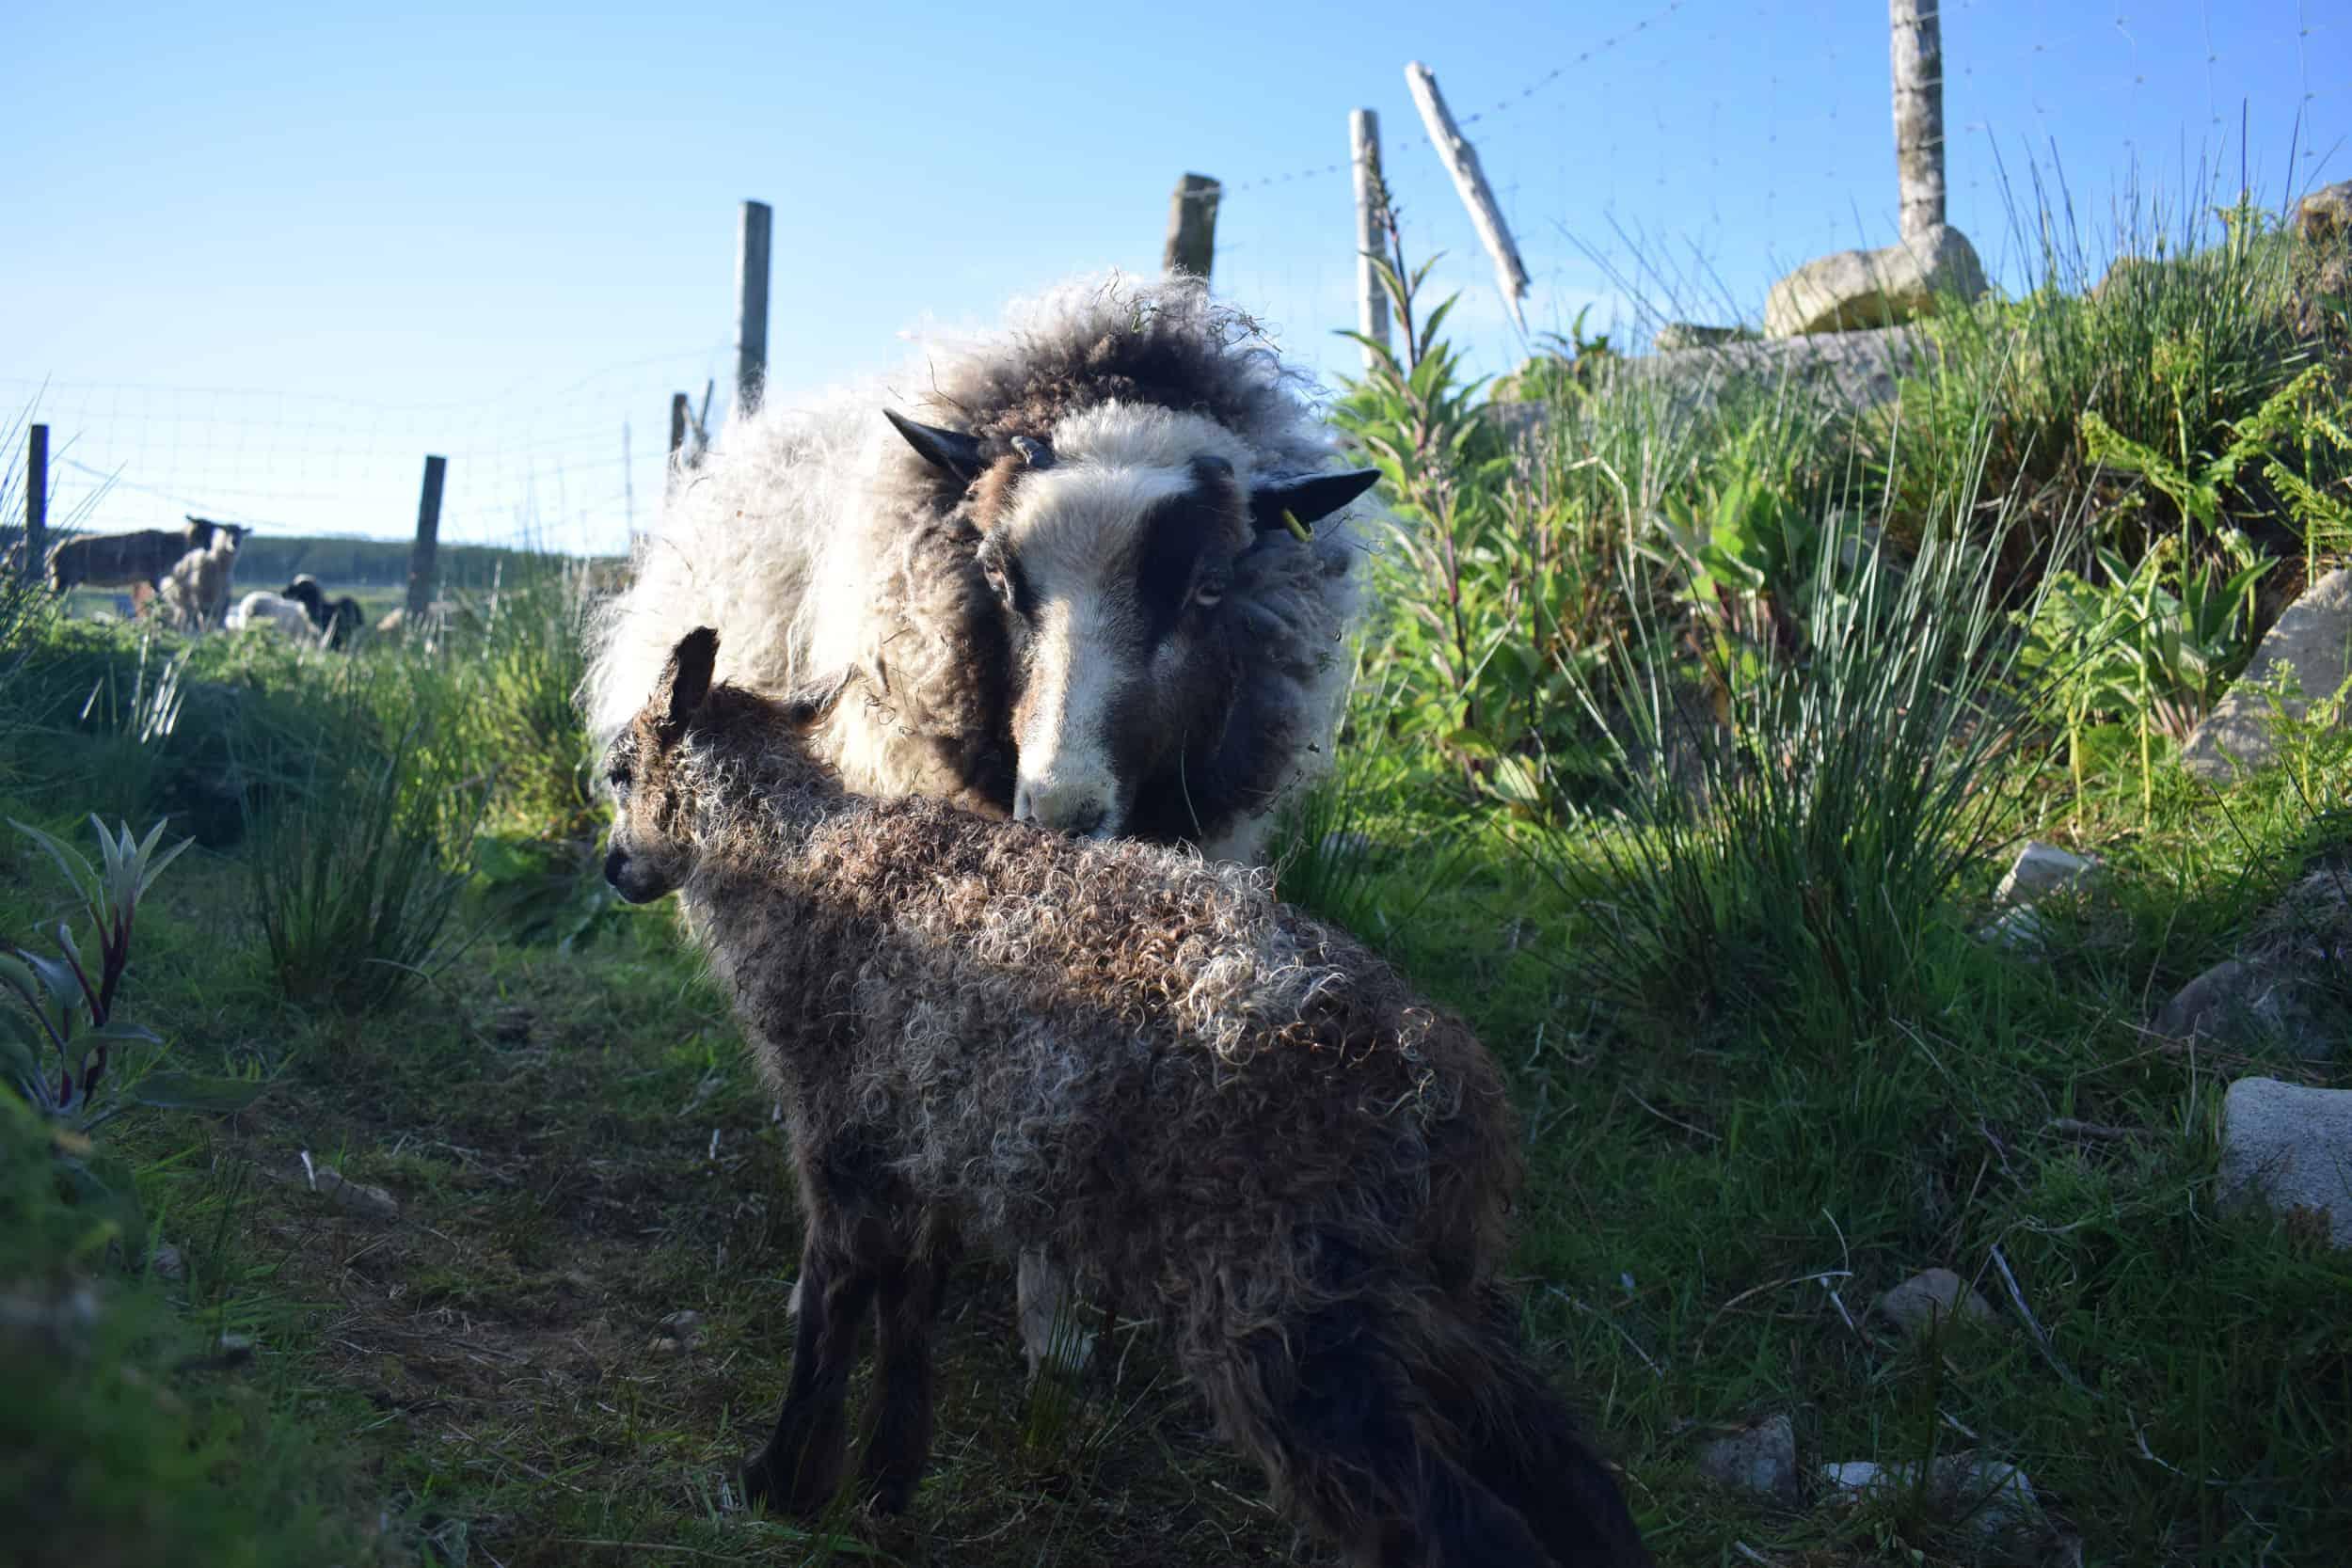 Waffle maple outdoor lambing newborn patchwork sheep lamb shetland sheep soay sheep